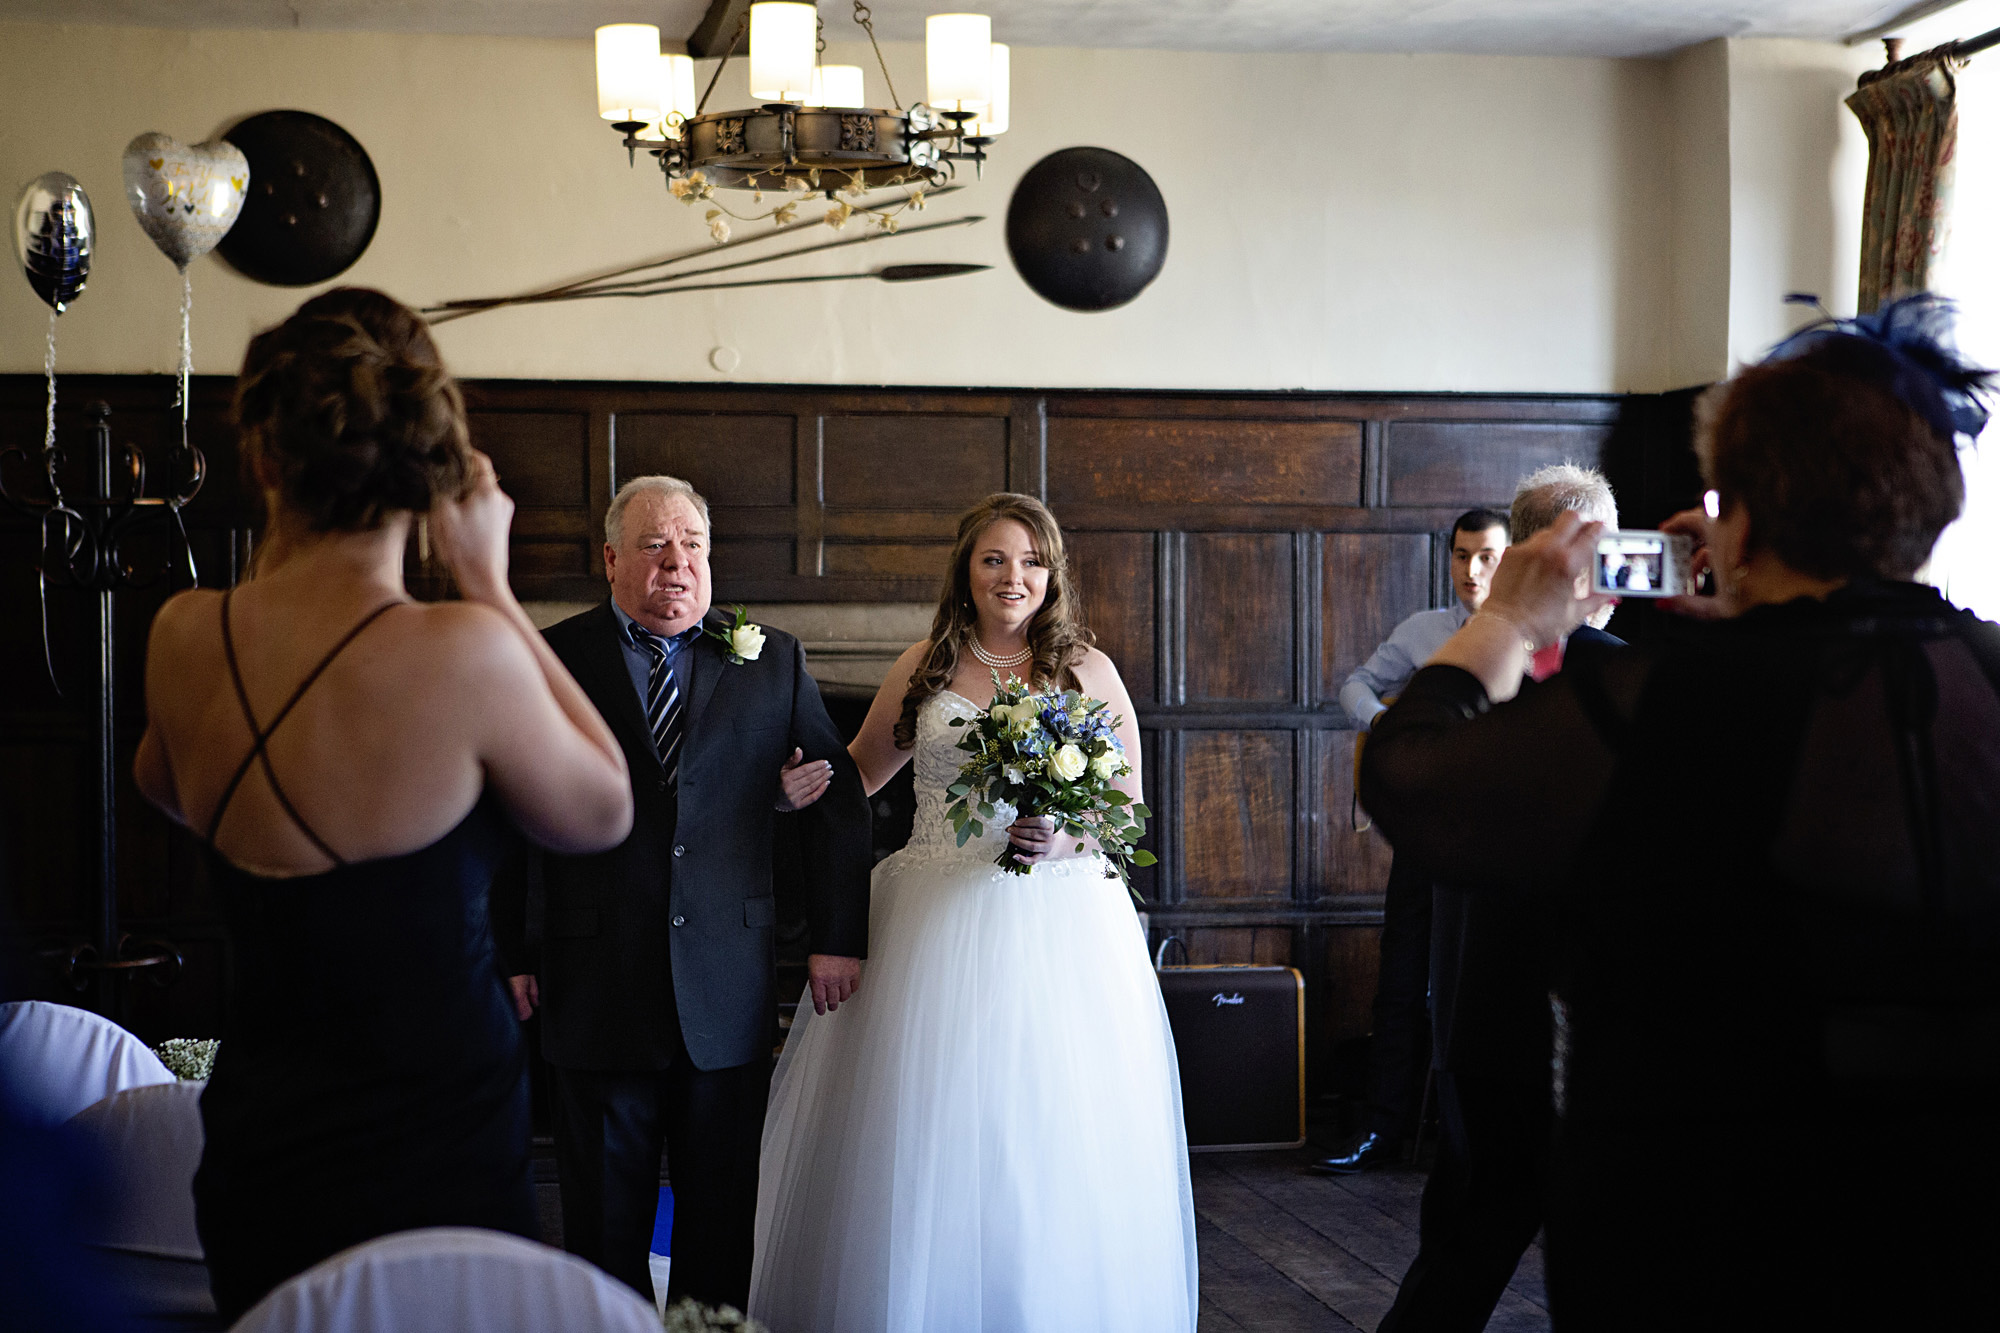 wedding-photos-talbot-hotel-oundle (8).jpg